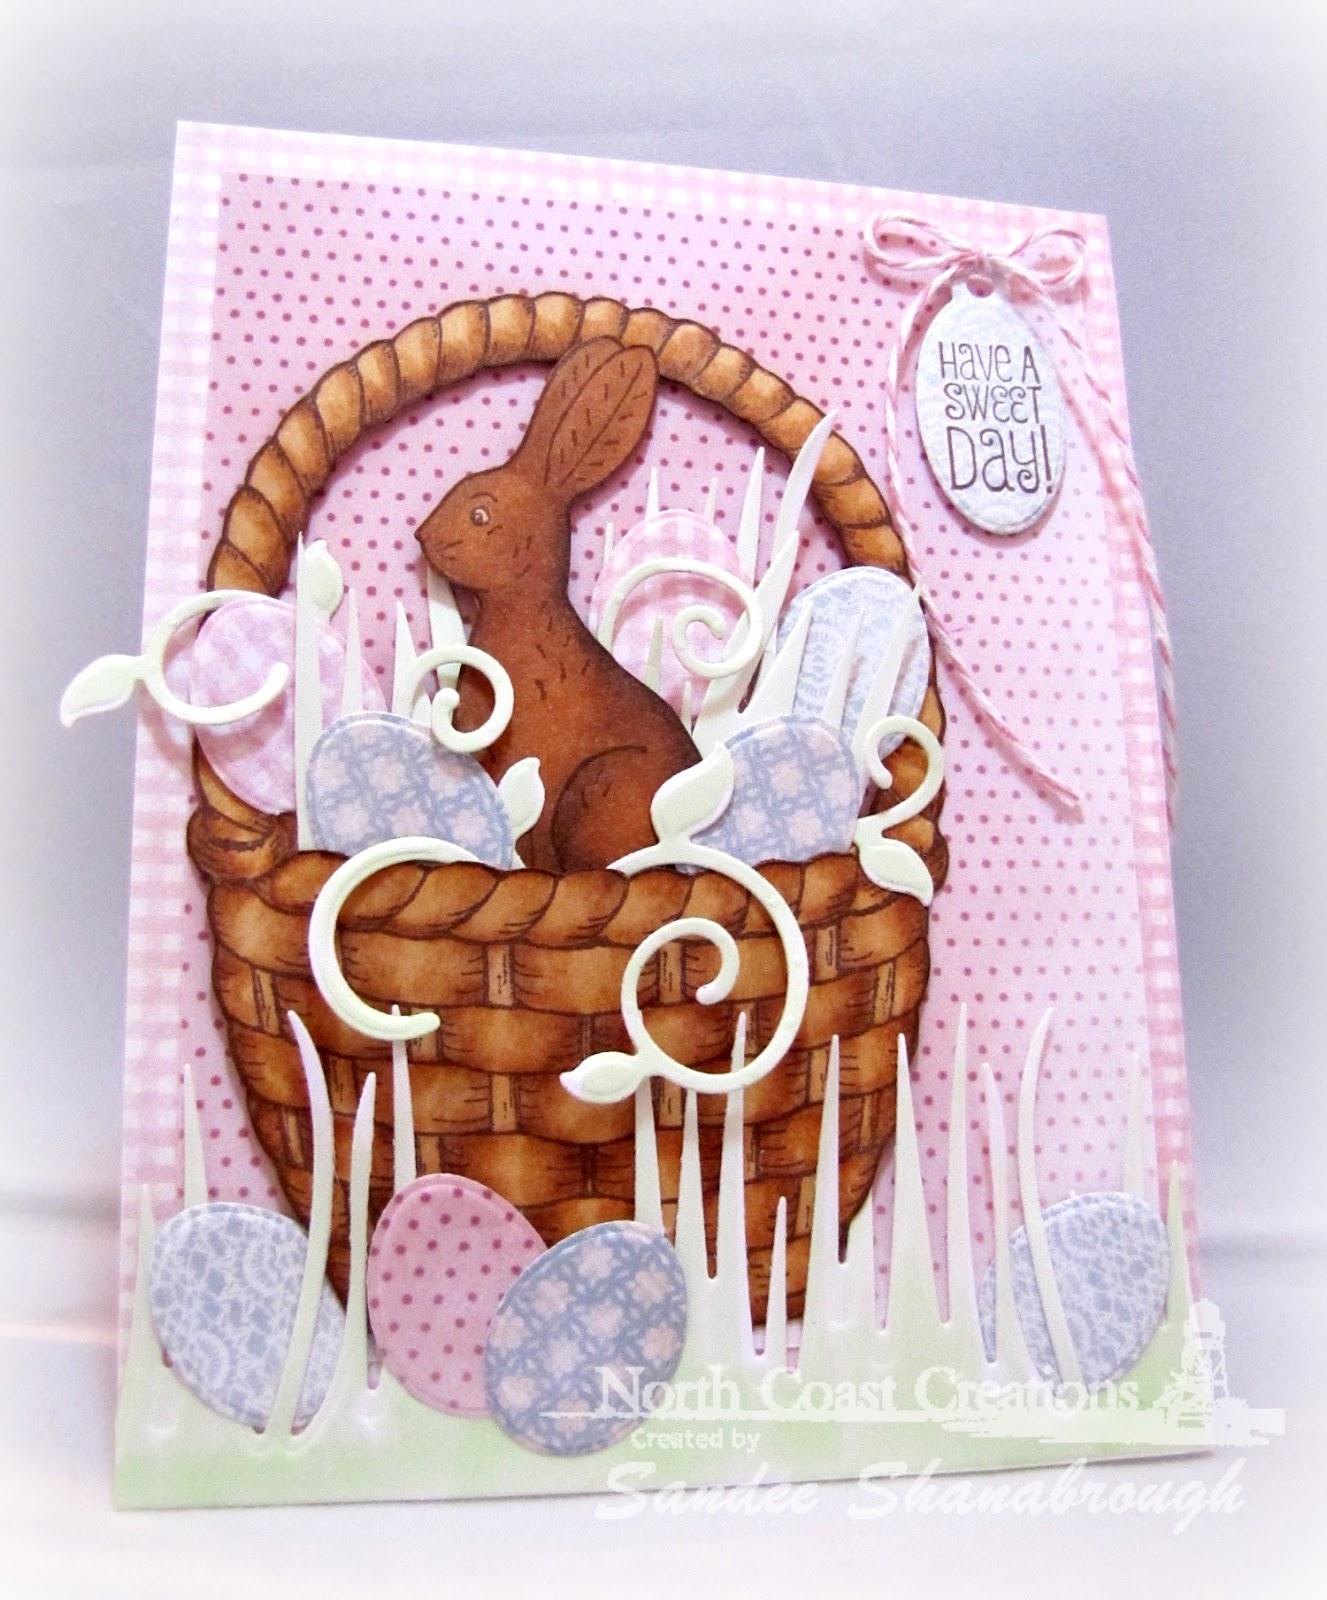 Stamps - North Coast Creations Chocolate Bunnies, ODBD Shabby Rose Paper Collection, ODBD Basket of Blessings, ODBD, Custom Eggs Dies, ODBD Custom Grass Border Die, ODBD Custom Fancy Foliage Die, ODBD Custom Mini Tags Dies